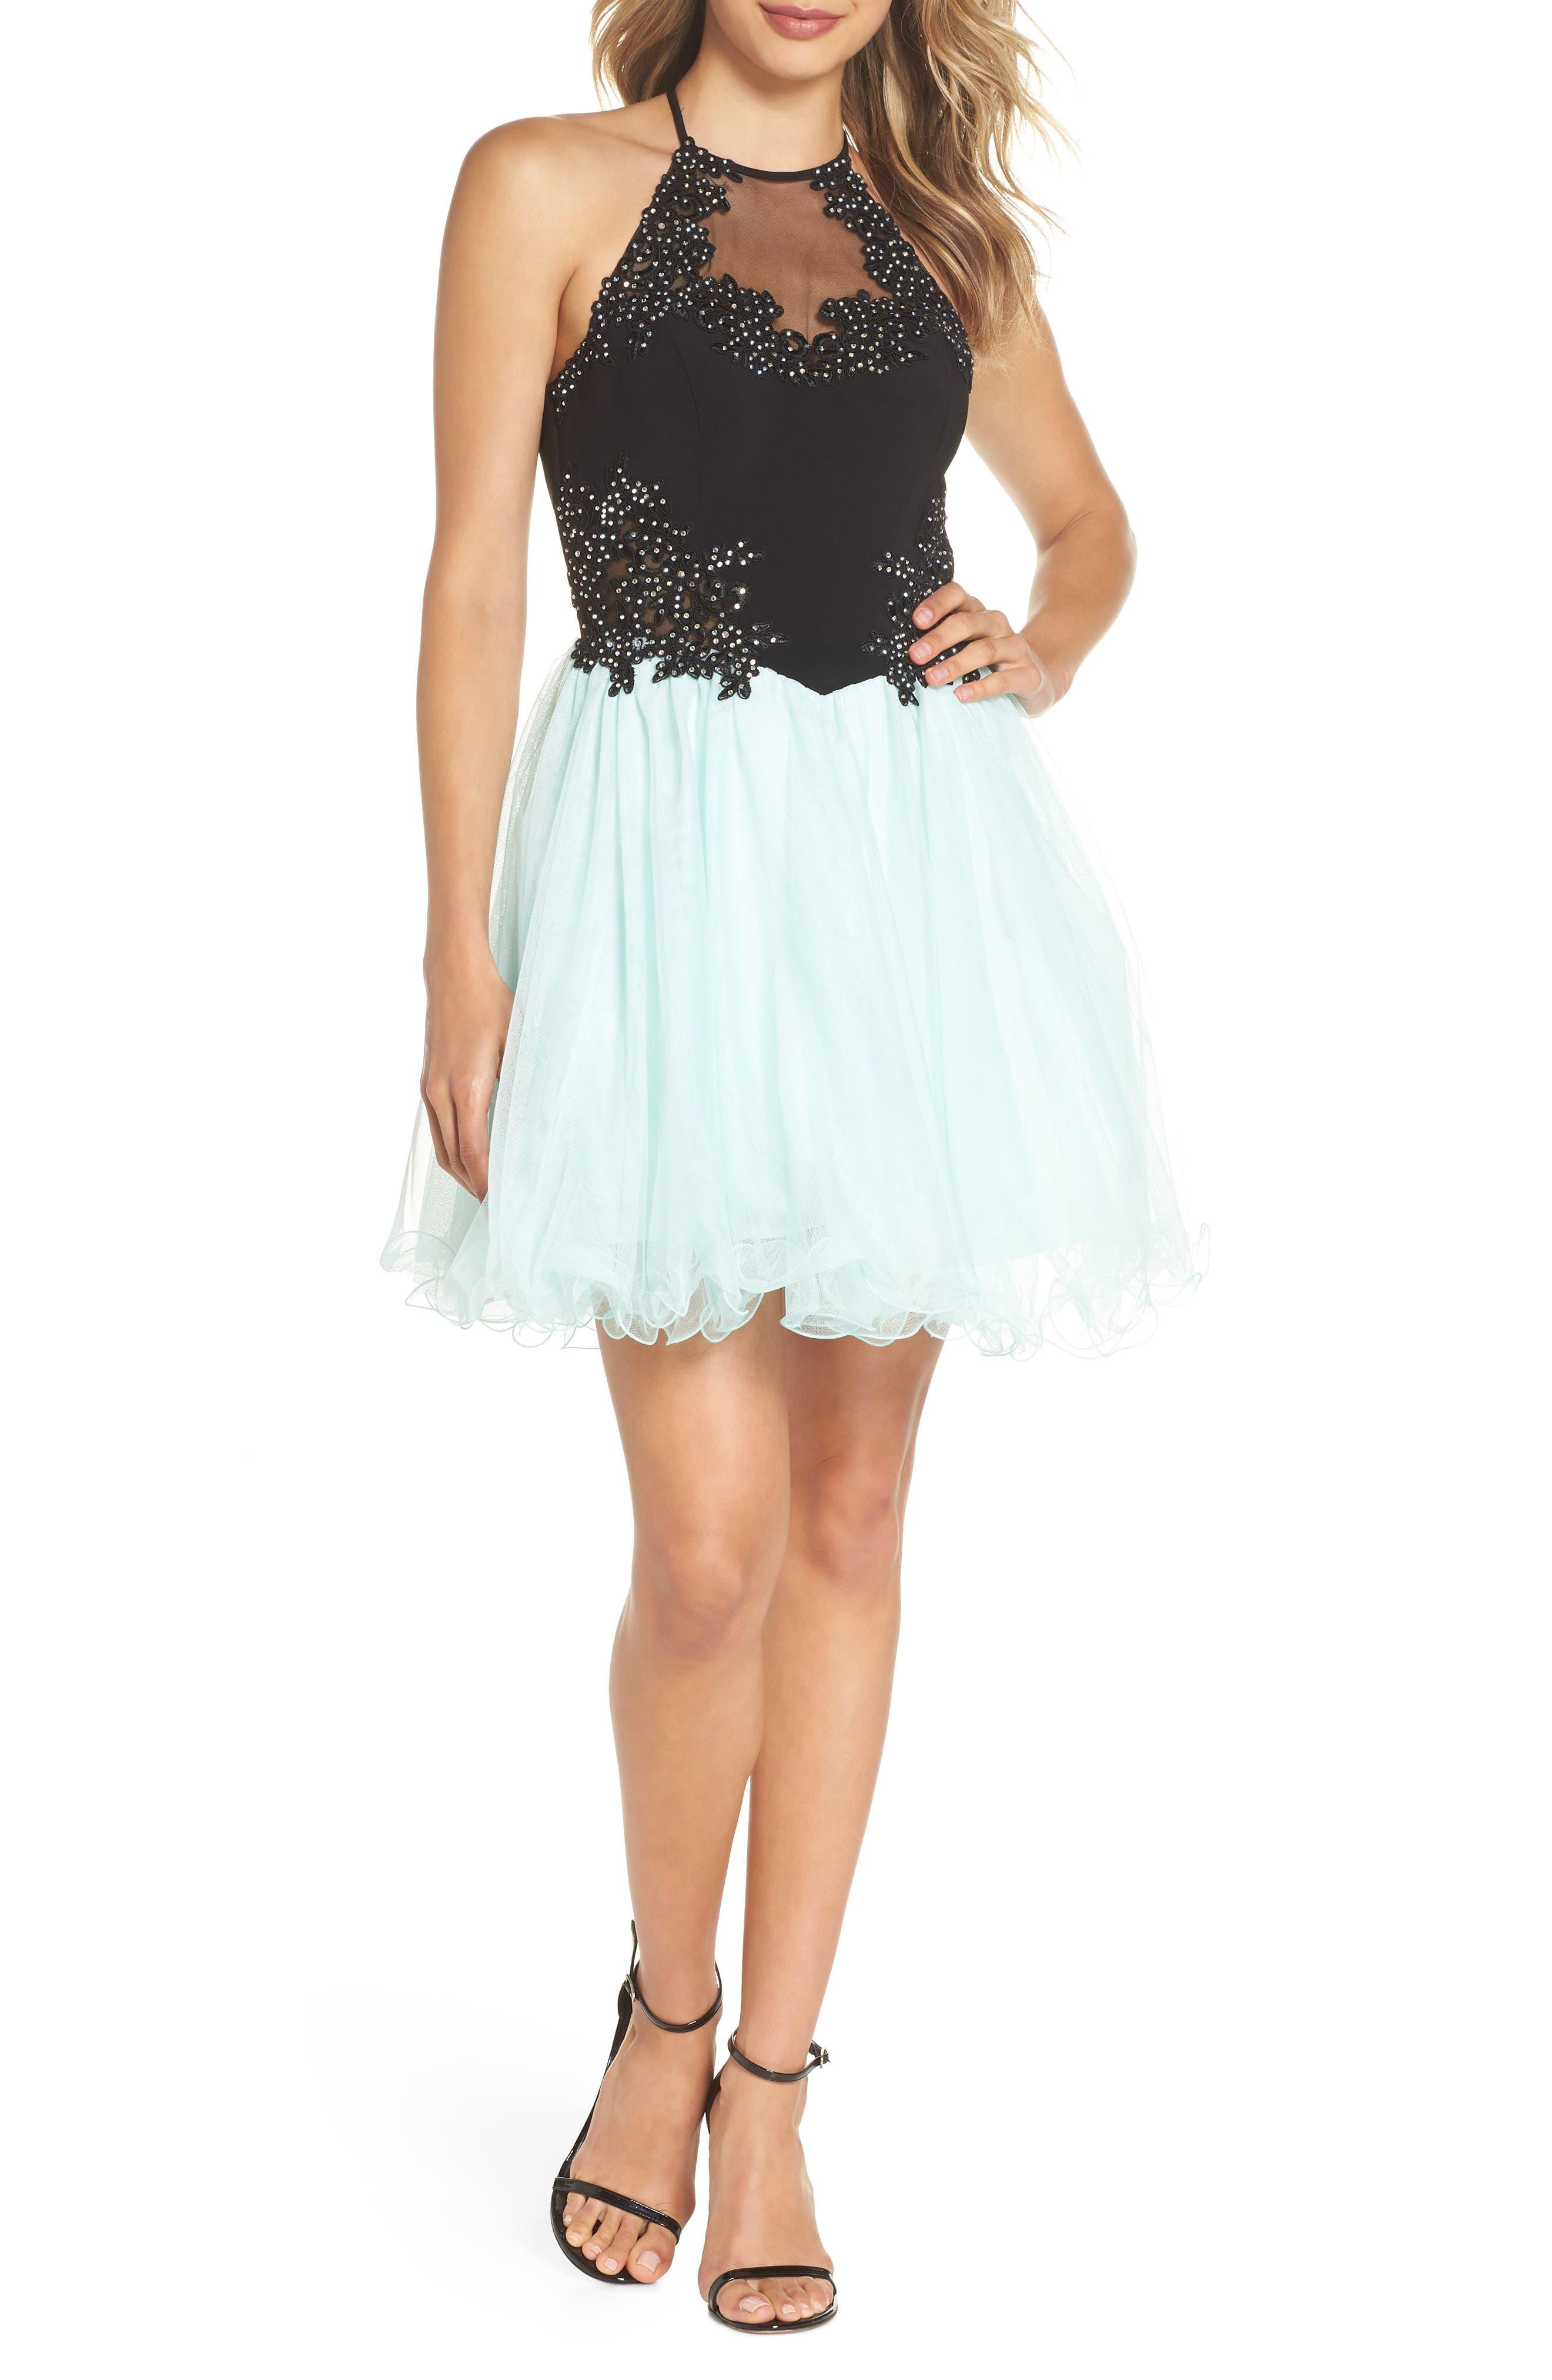 Blondie Nites Applique Mesh Fit & Flare Halter Dress, Black